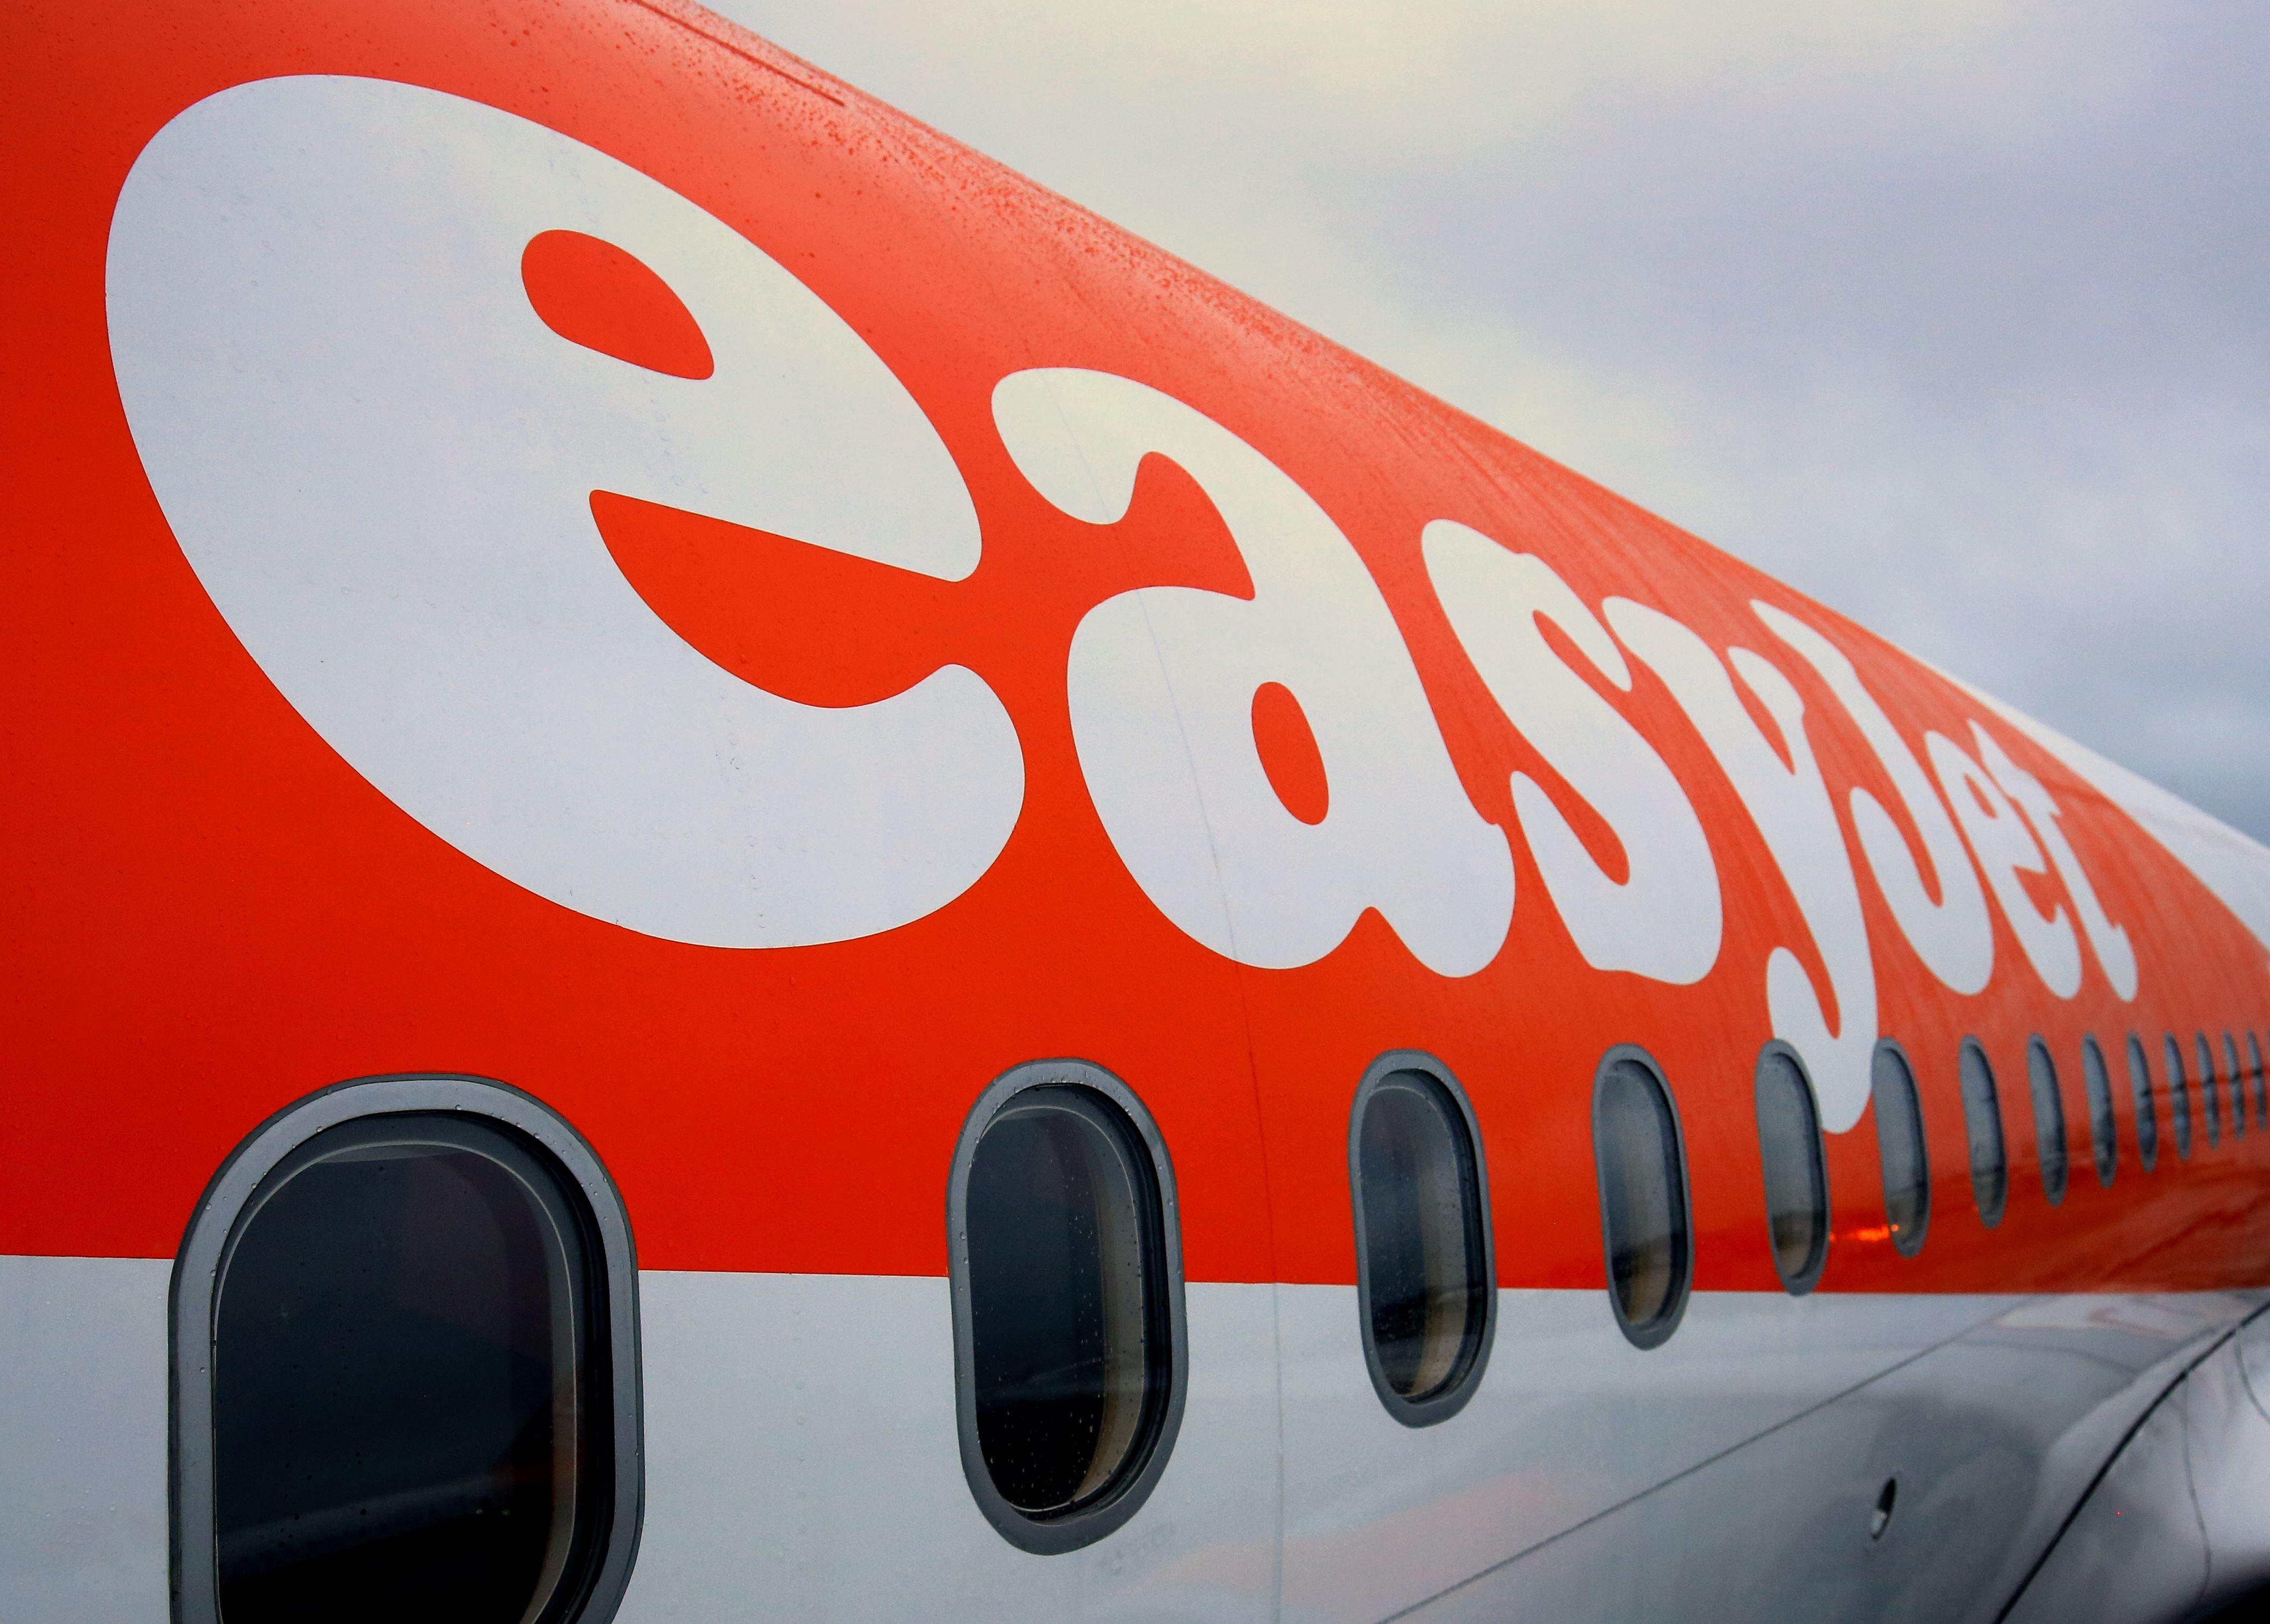 easyjet flights - photo #34